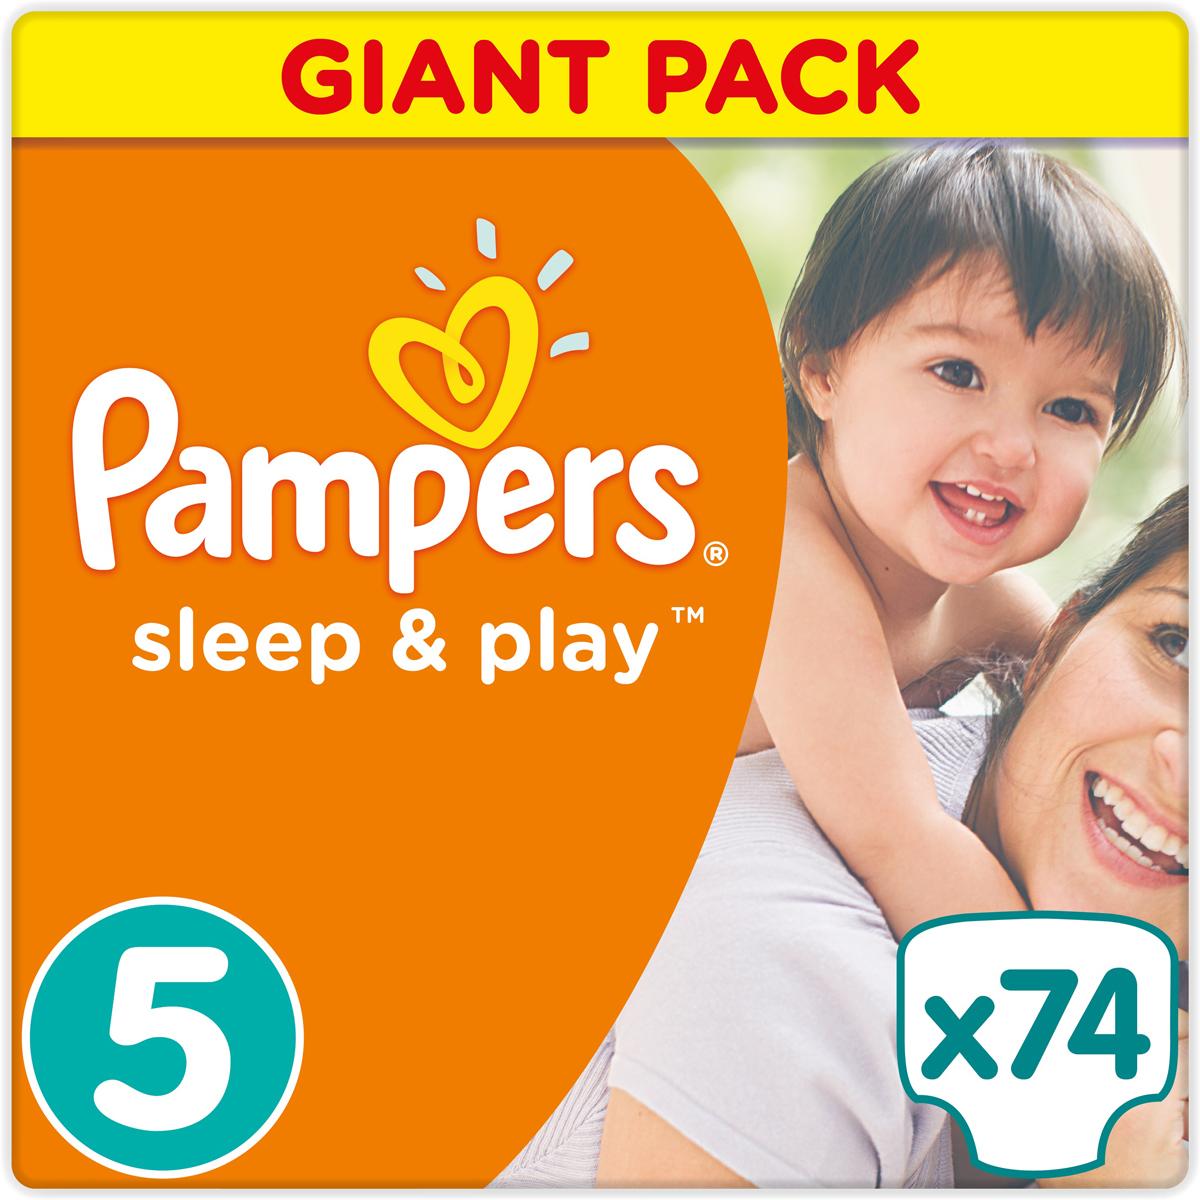 Pampers Подгузники Sleep & Play 11-18 кг (размер 5) 74 шт - Подгузники и пеленки